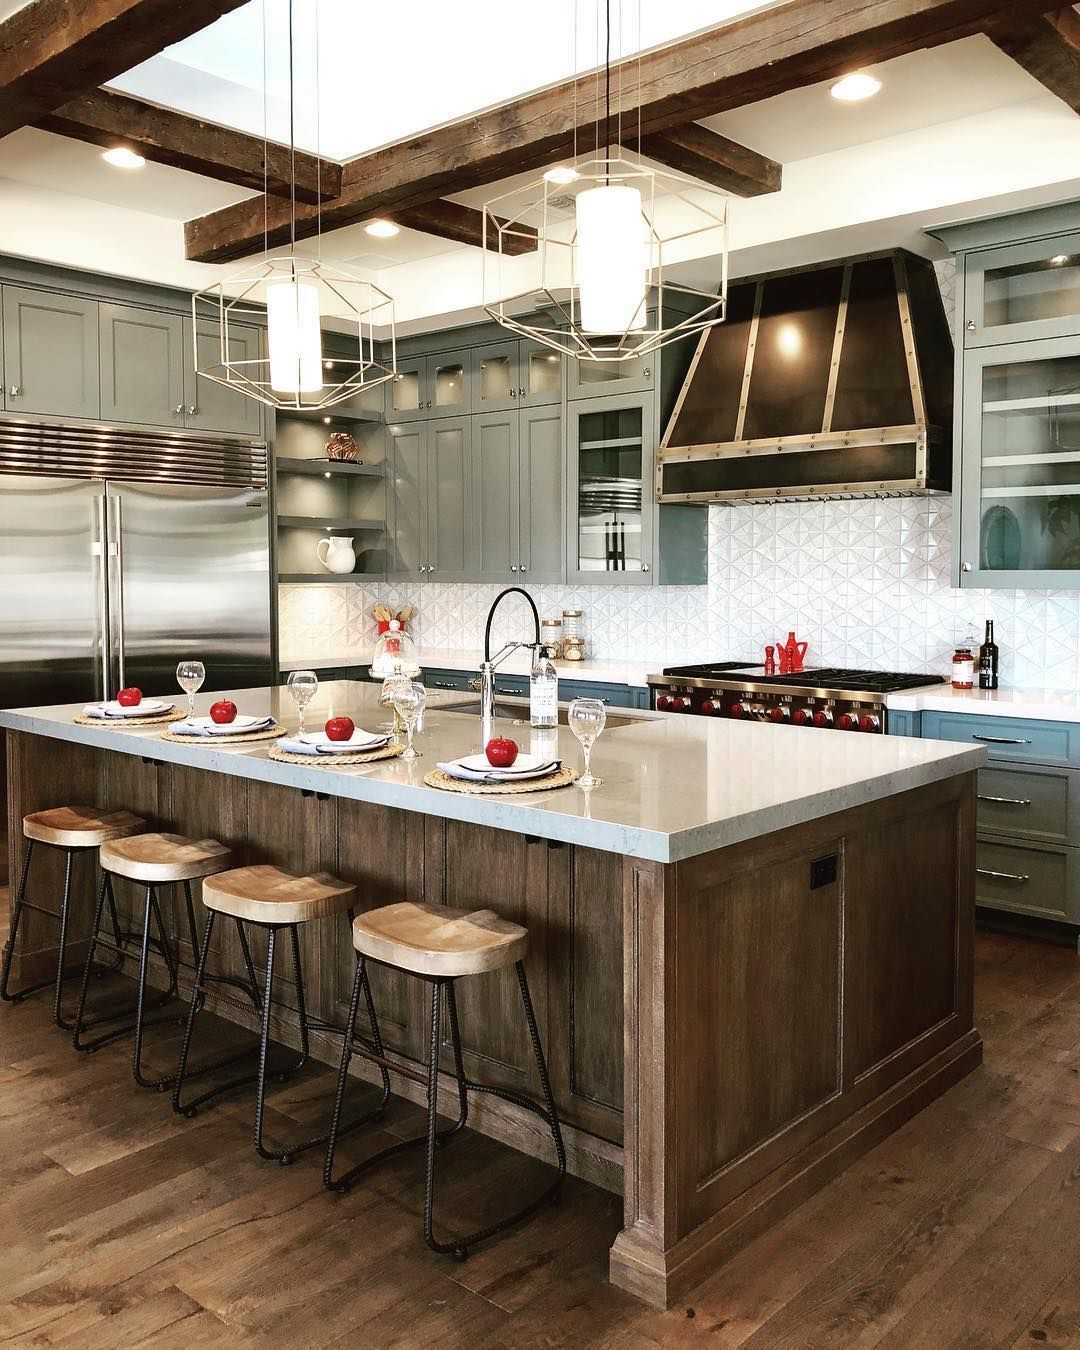 Beautiful Industrial Farmhouse Kitchen Featuring Our Silhouette Pendants Design Avrilinter Interior Design Kitchen Small Kitchen Design Kitchen Renovation